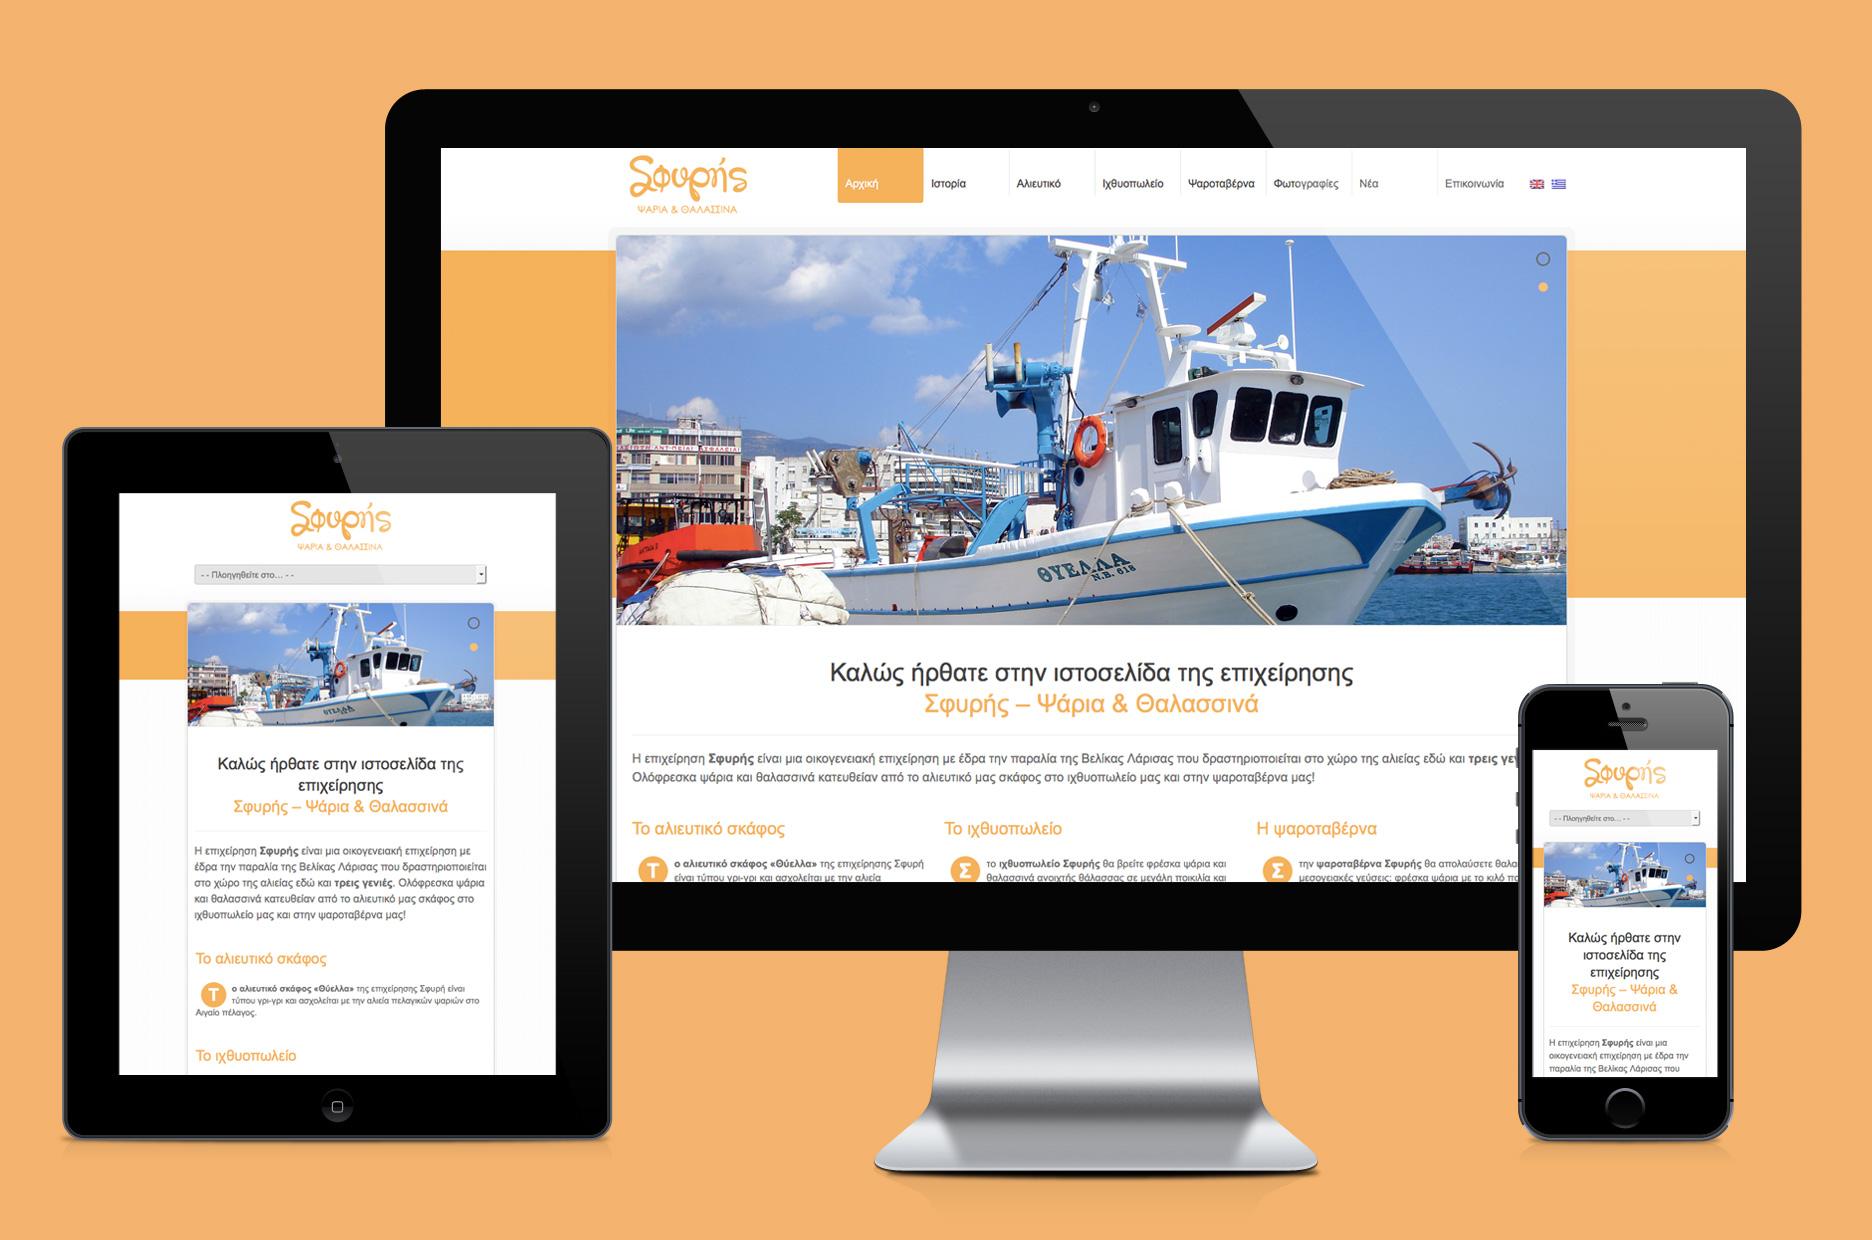 Sfyris website